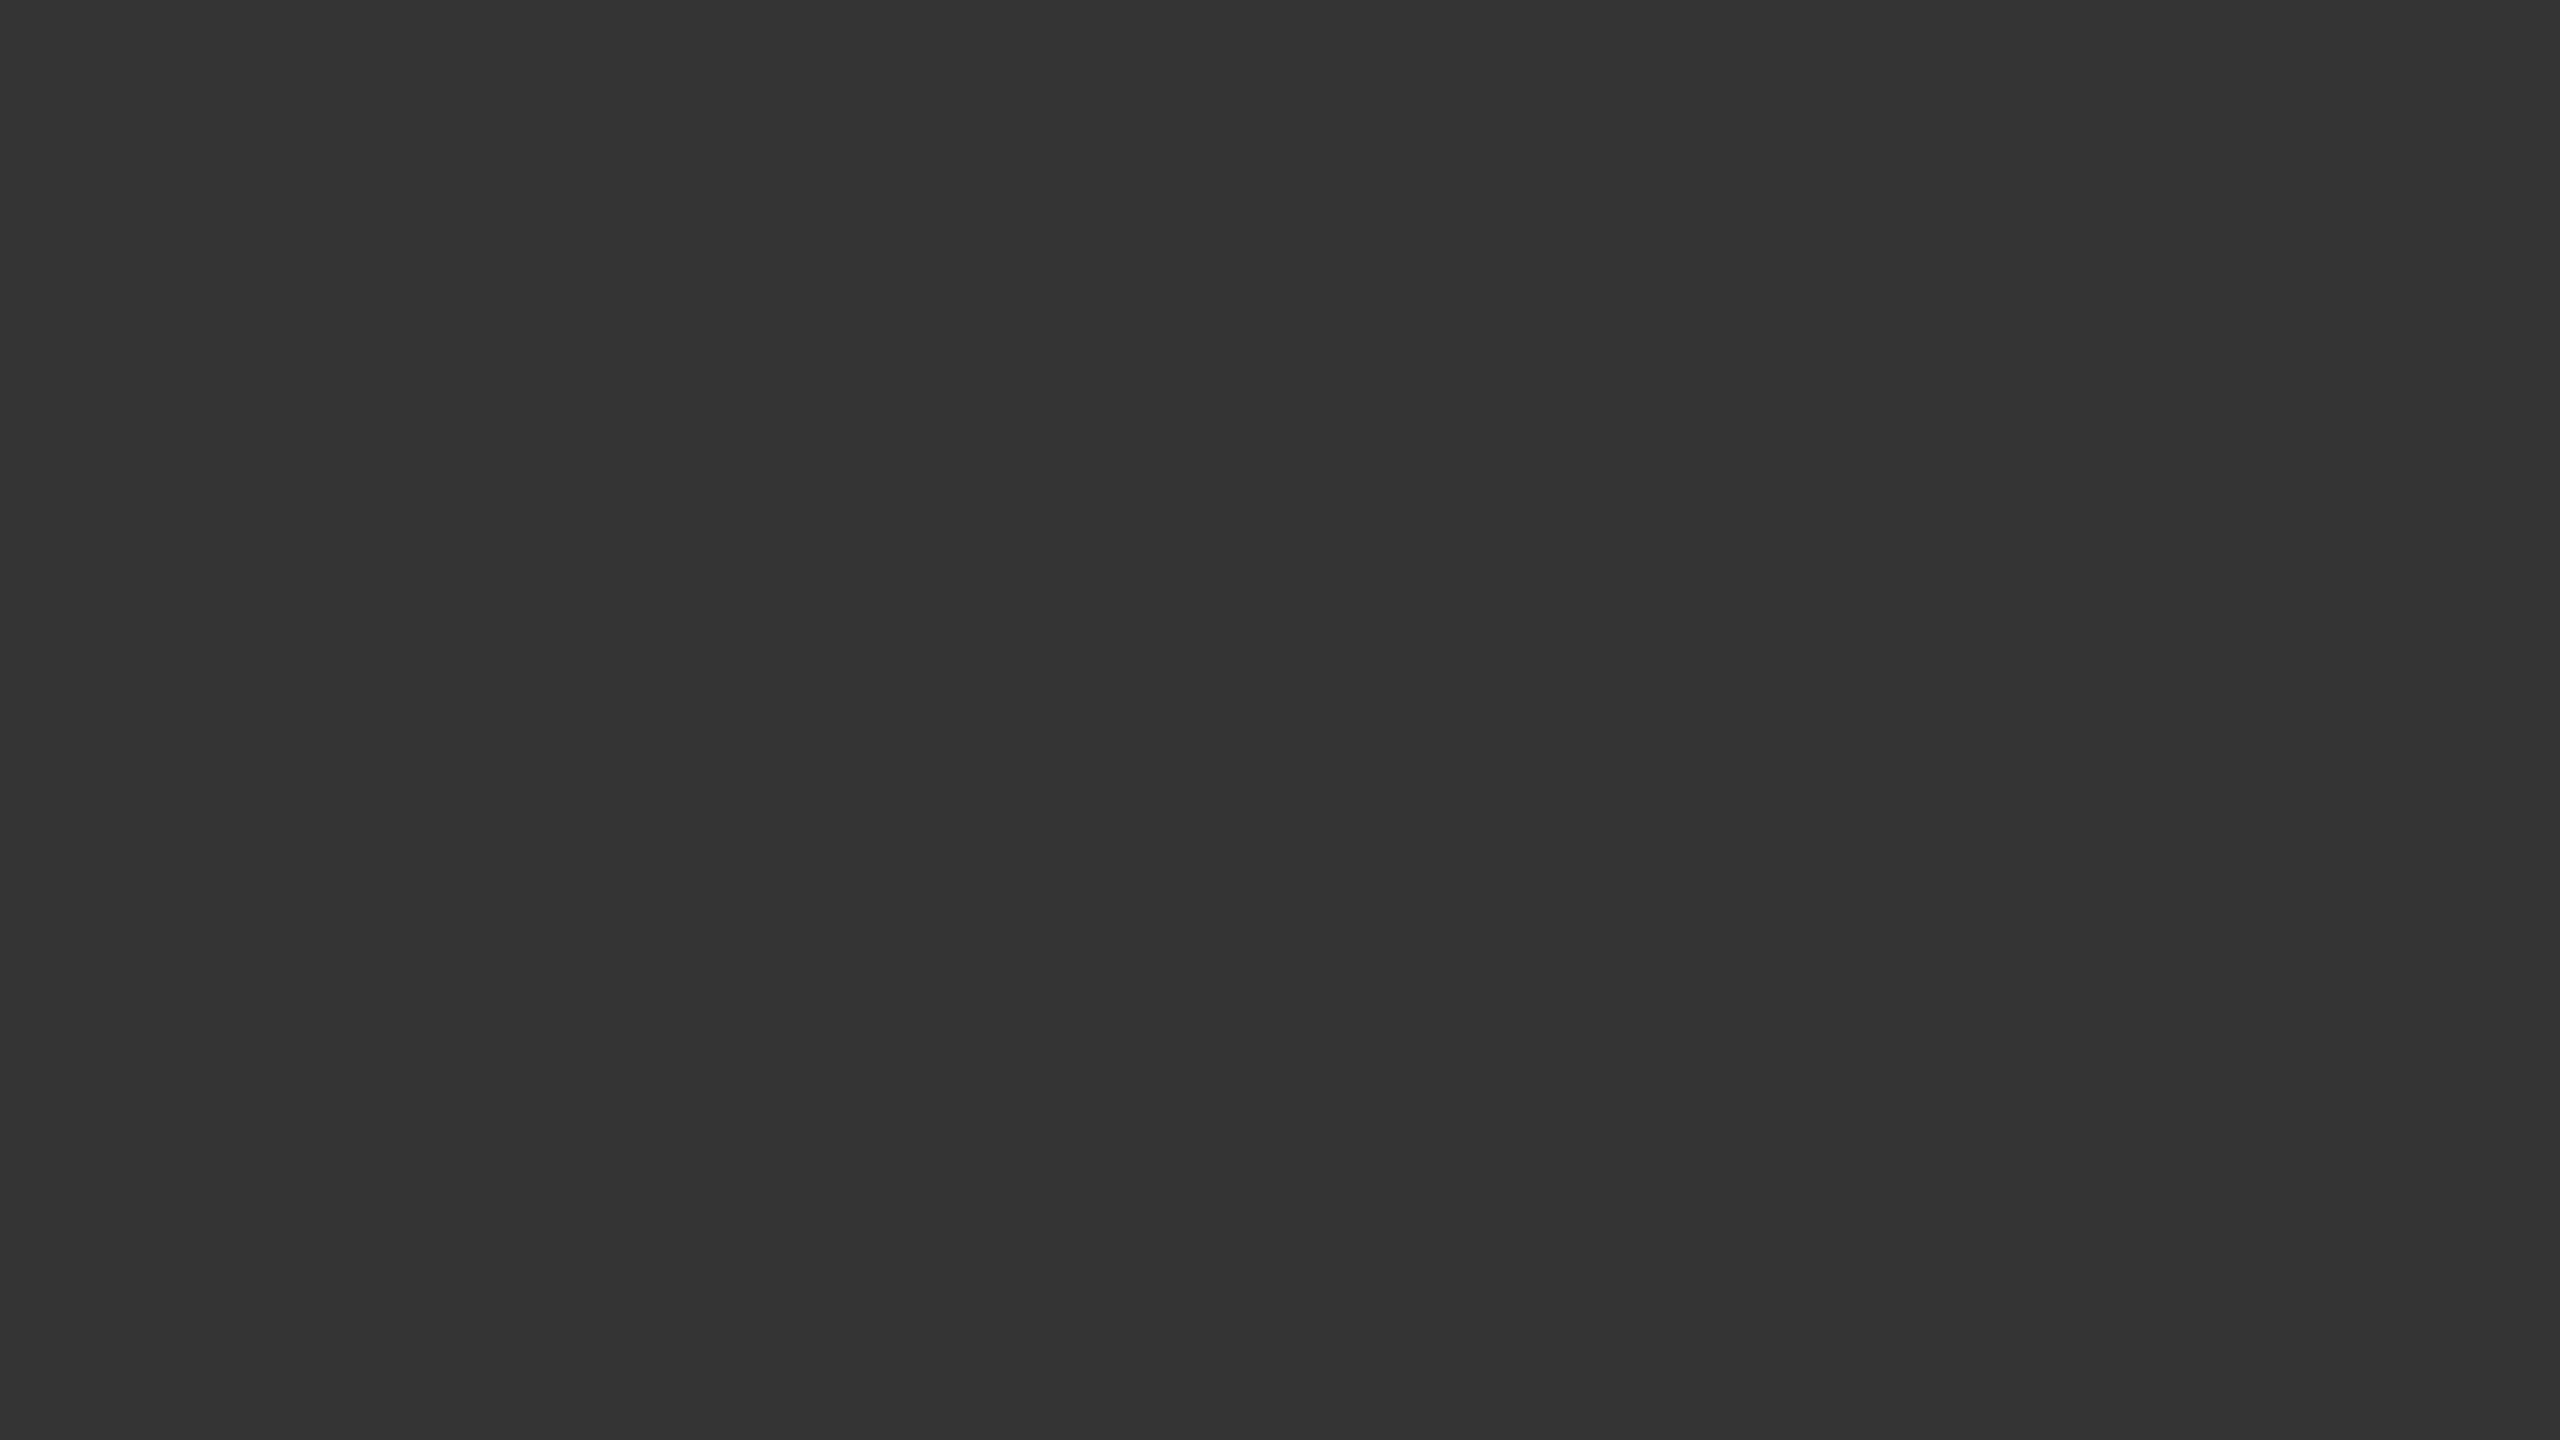 this Dark Gray Desktop Wallpaper is easy Just save the wallpaper 2560x1440